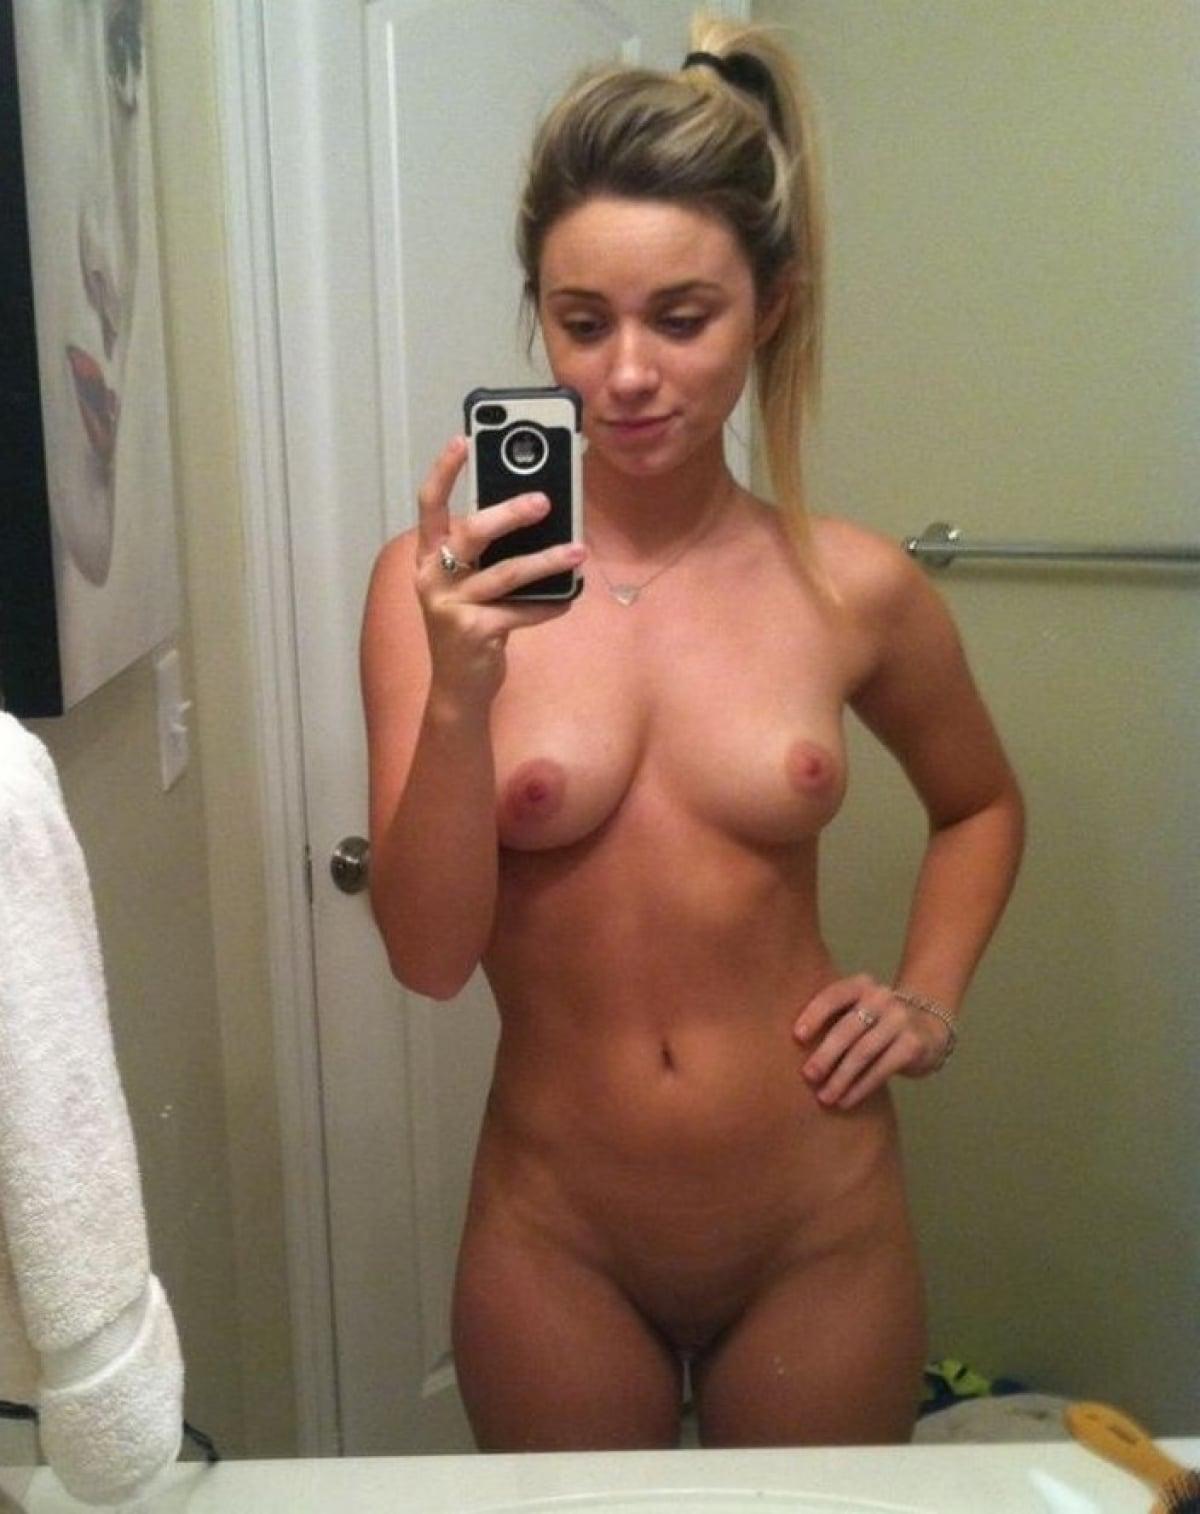 https://sexyna.org/wp-content/uploads/2019/08/Nahaté-selfie-amatérek-63.jpg